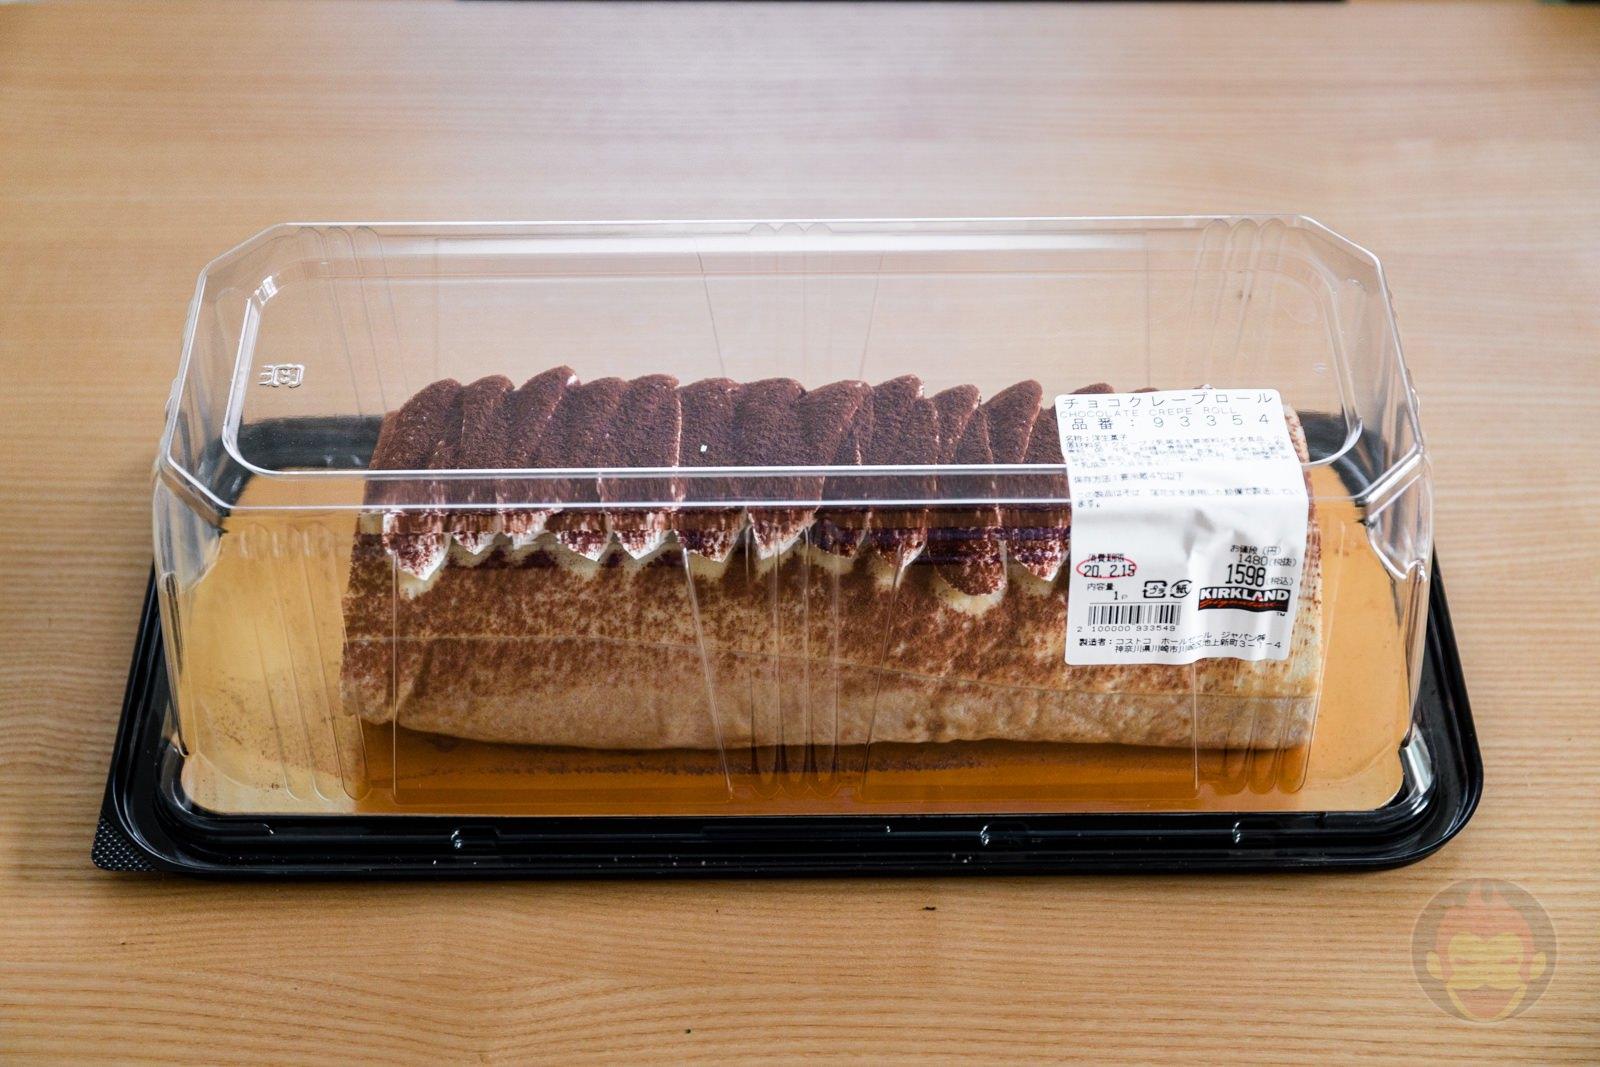 Chocolate Crape Roll Costco Dessert 11